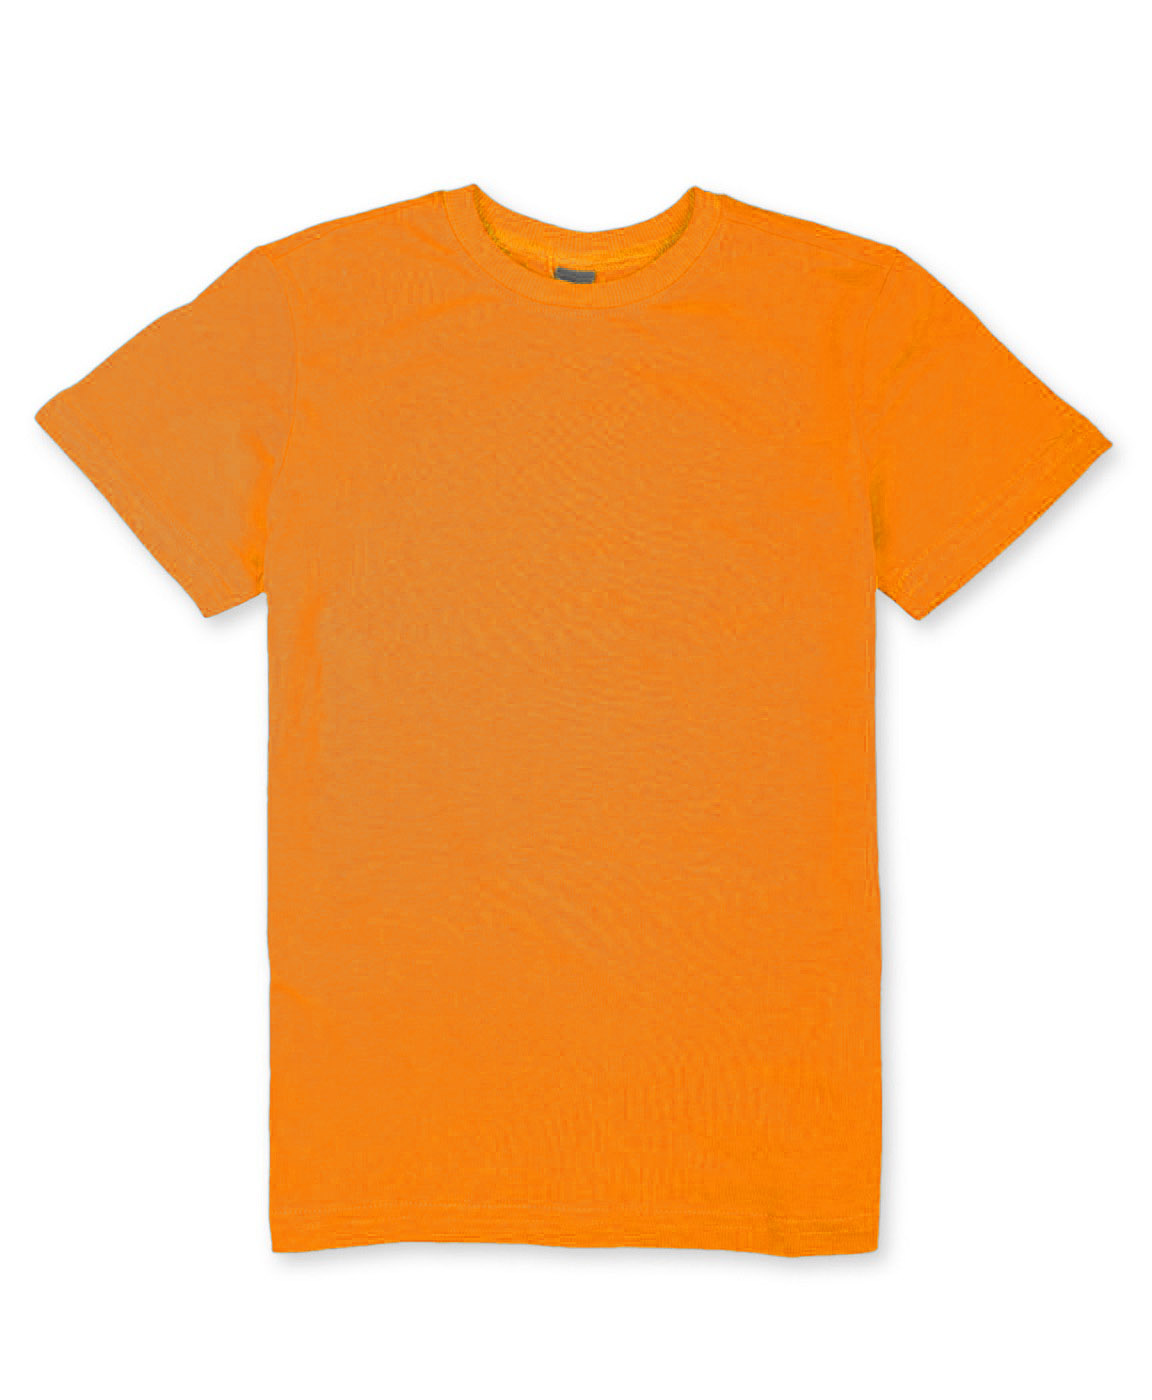 Футболка однотонная оранжеваяКоллекция ВЕСНА-ЛЕТО<br><br><br>Размер: 64